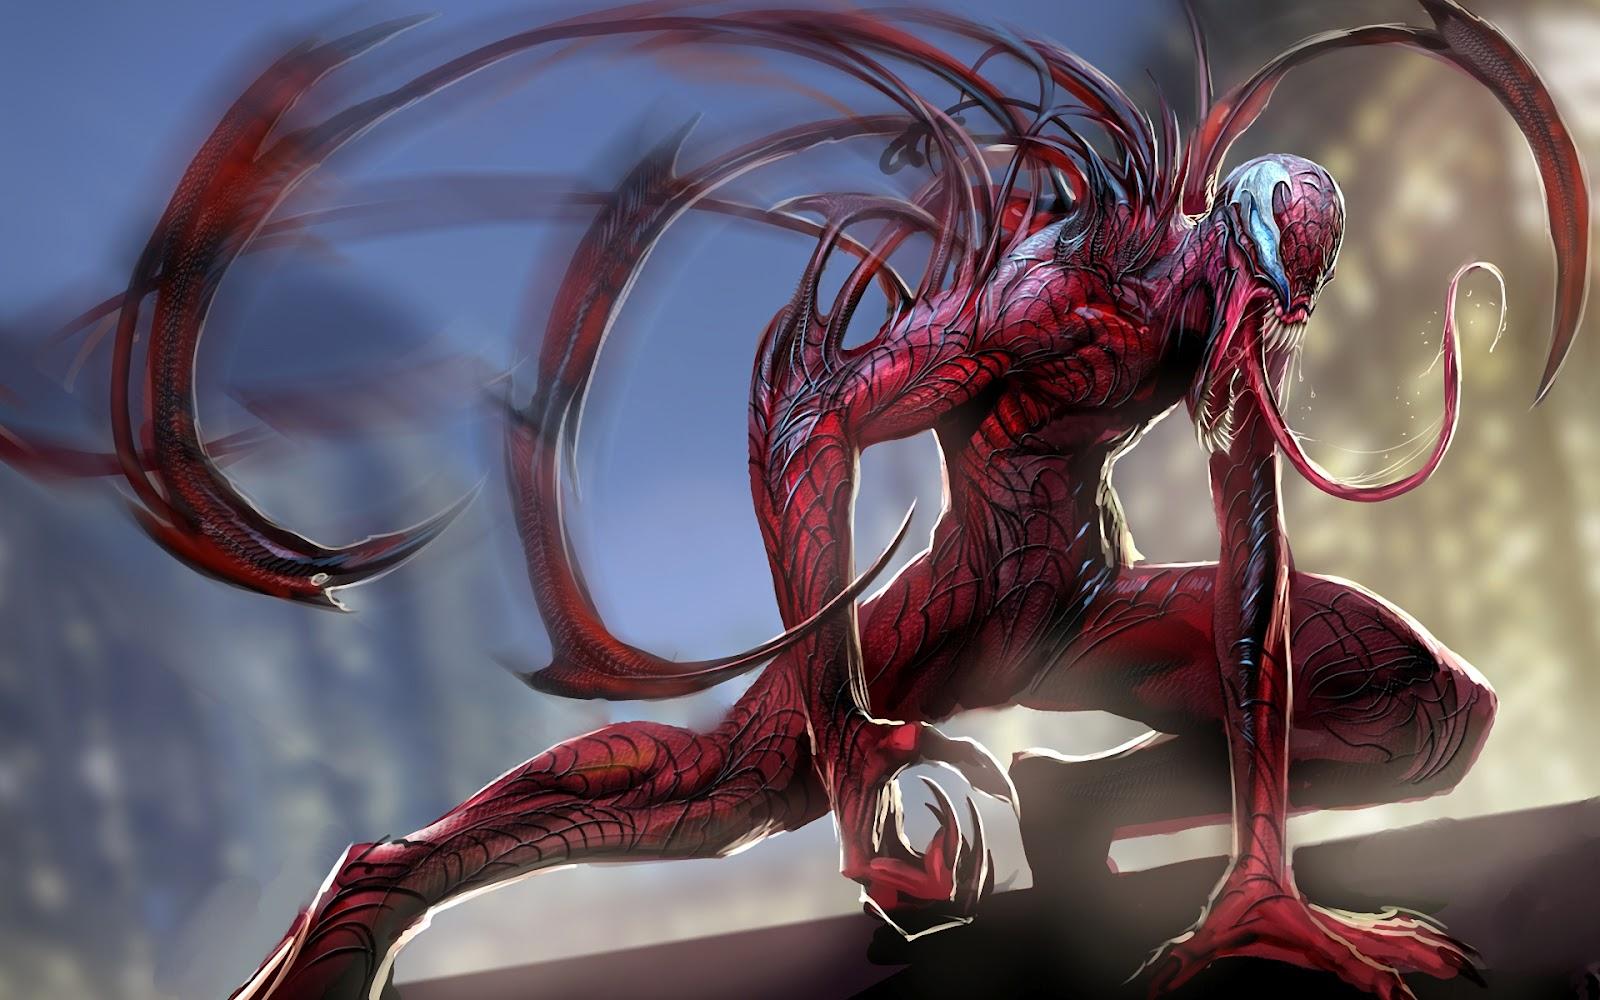 http://4.bp.blogspot.com/-WXvaLPPoRFg/UGRE4puEBJI/AAAAAAAAo0E/TX_uLOsKP2c/s1600/Spiderman-Carnage-Marvel-Comics_Fondos-de-Pantalla-HD.jpg